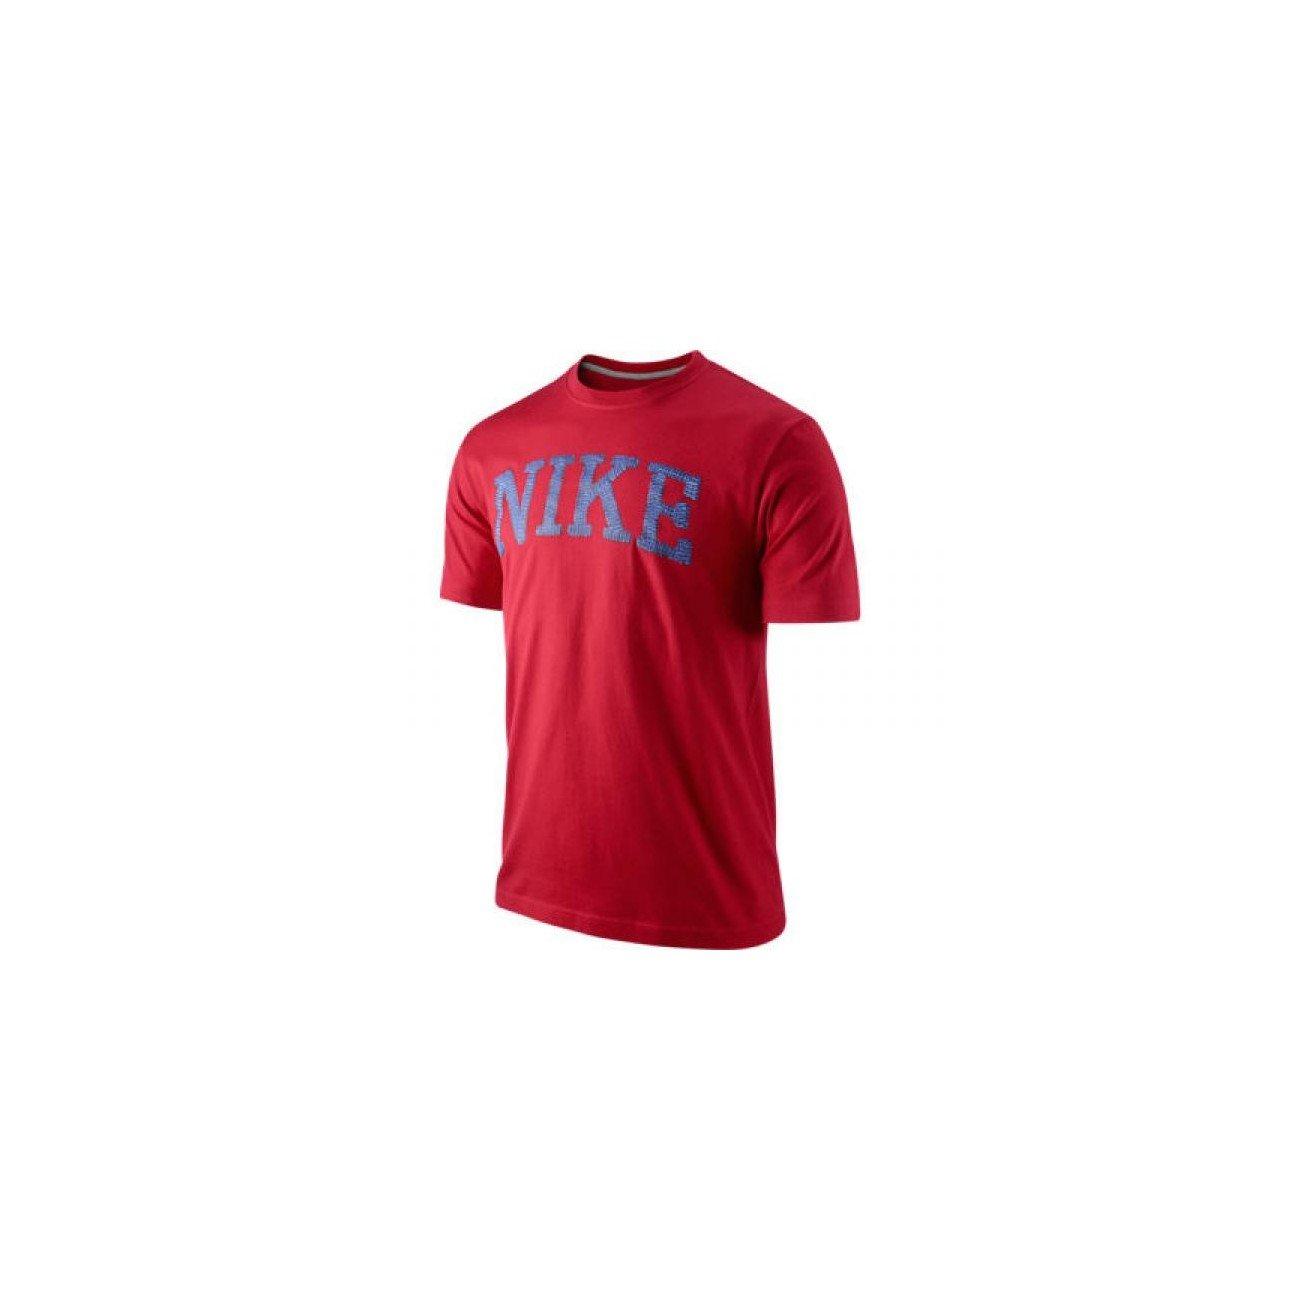 Nike Camiseta roja de Manga Corta - 06 - L, Rojo: Amazon.es: Ropa ...